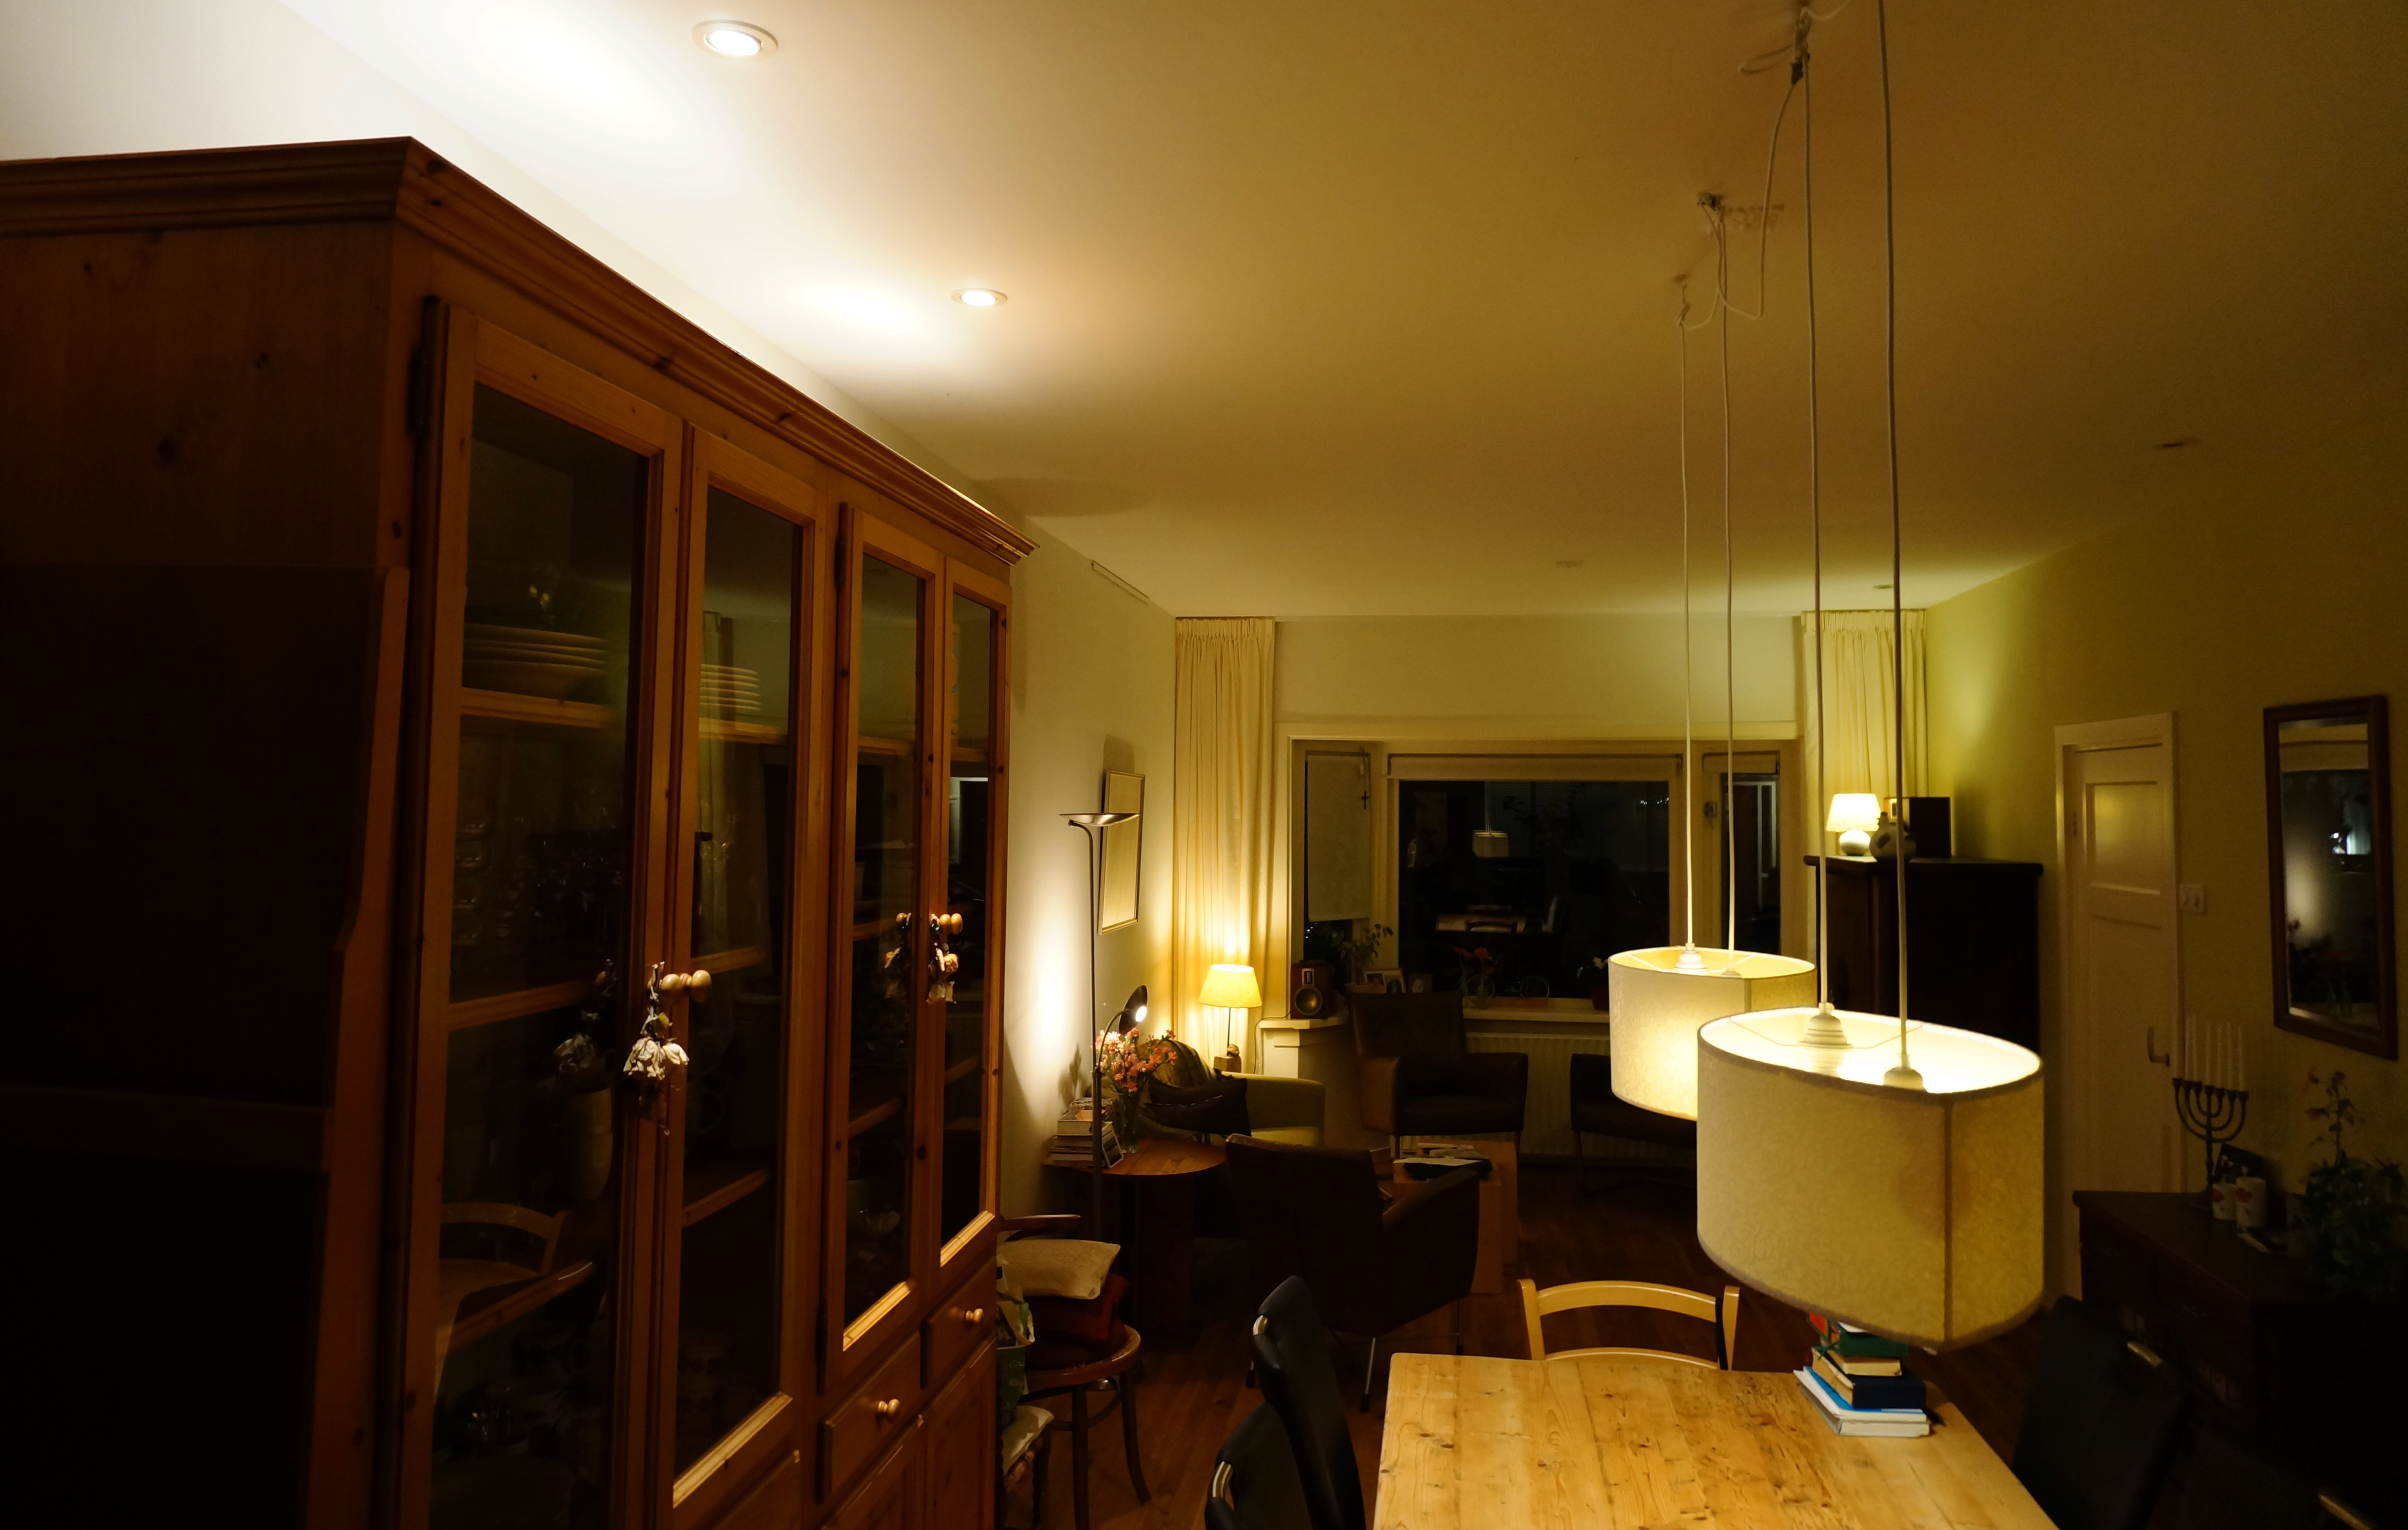 verlichting woonkamer – henk 50